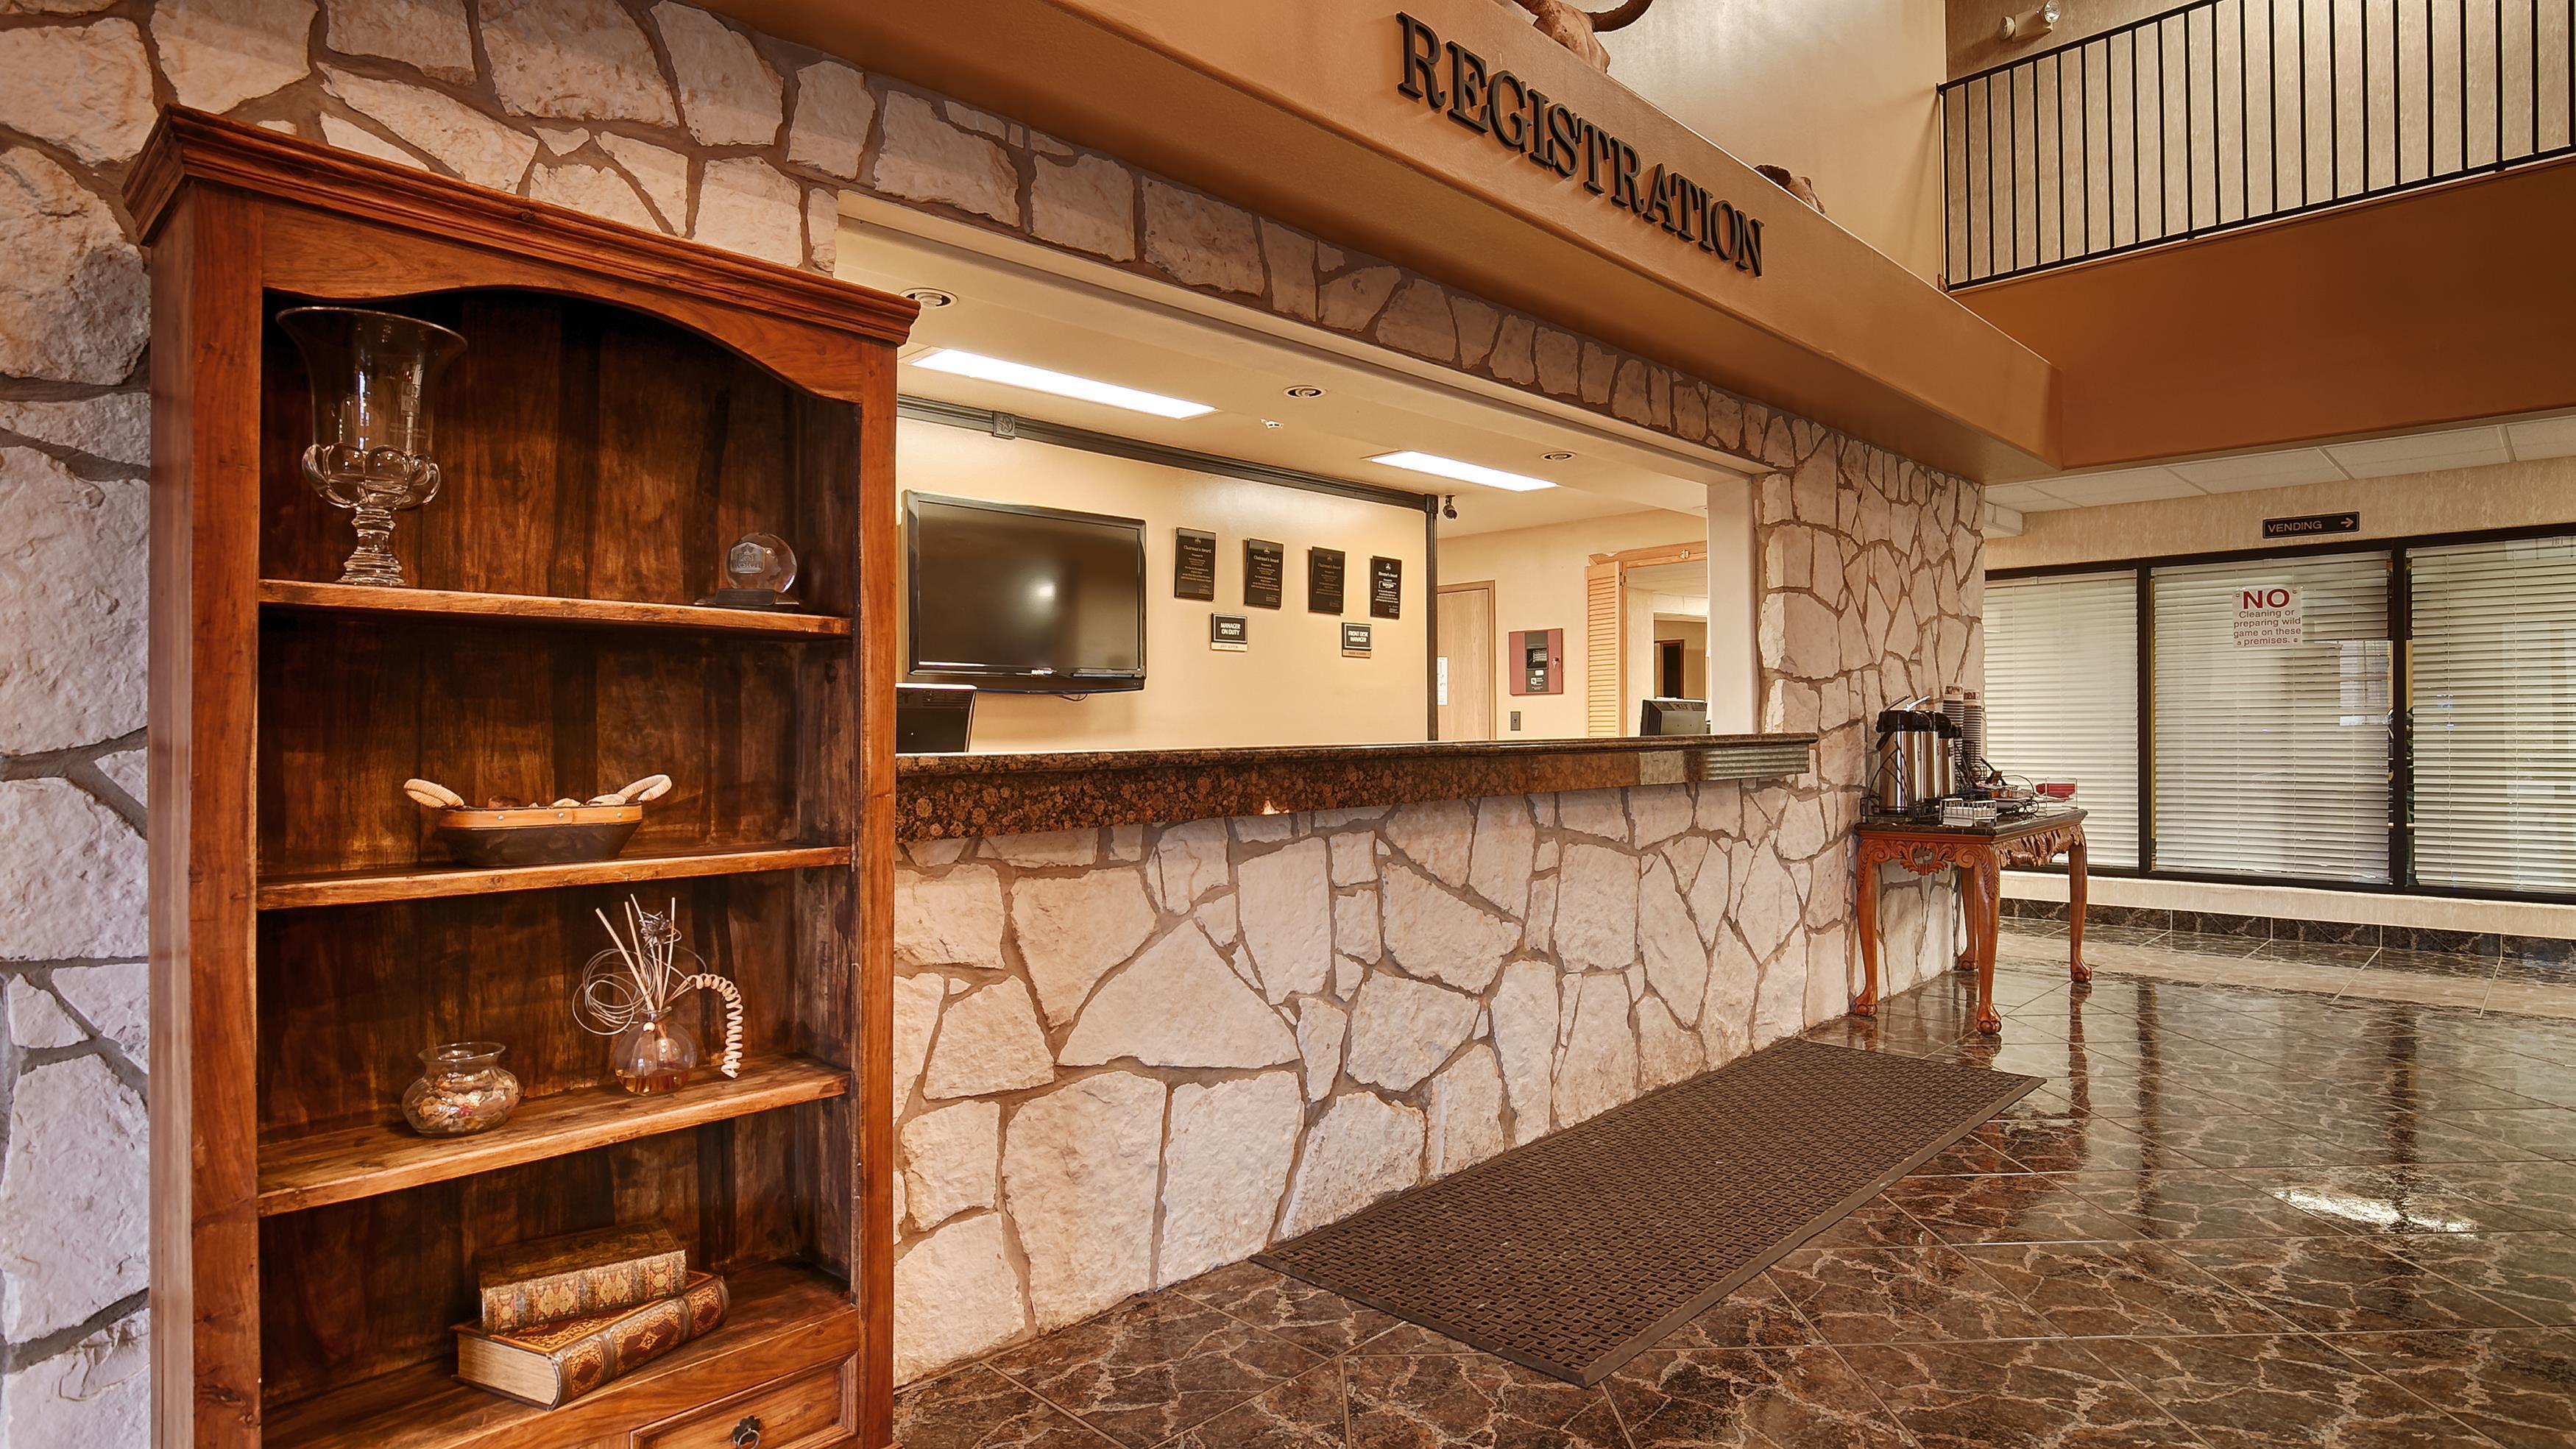 Best Western Texan Inn image 21